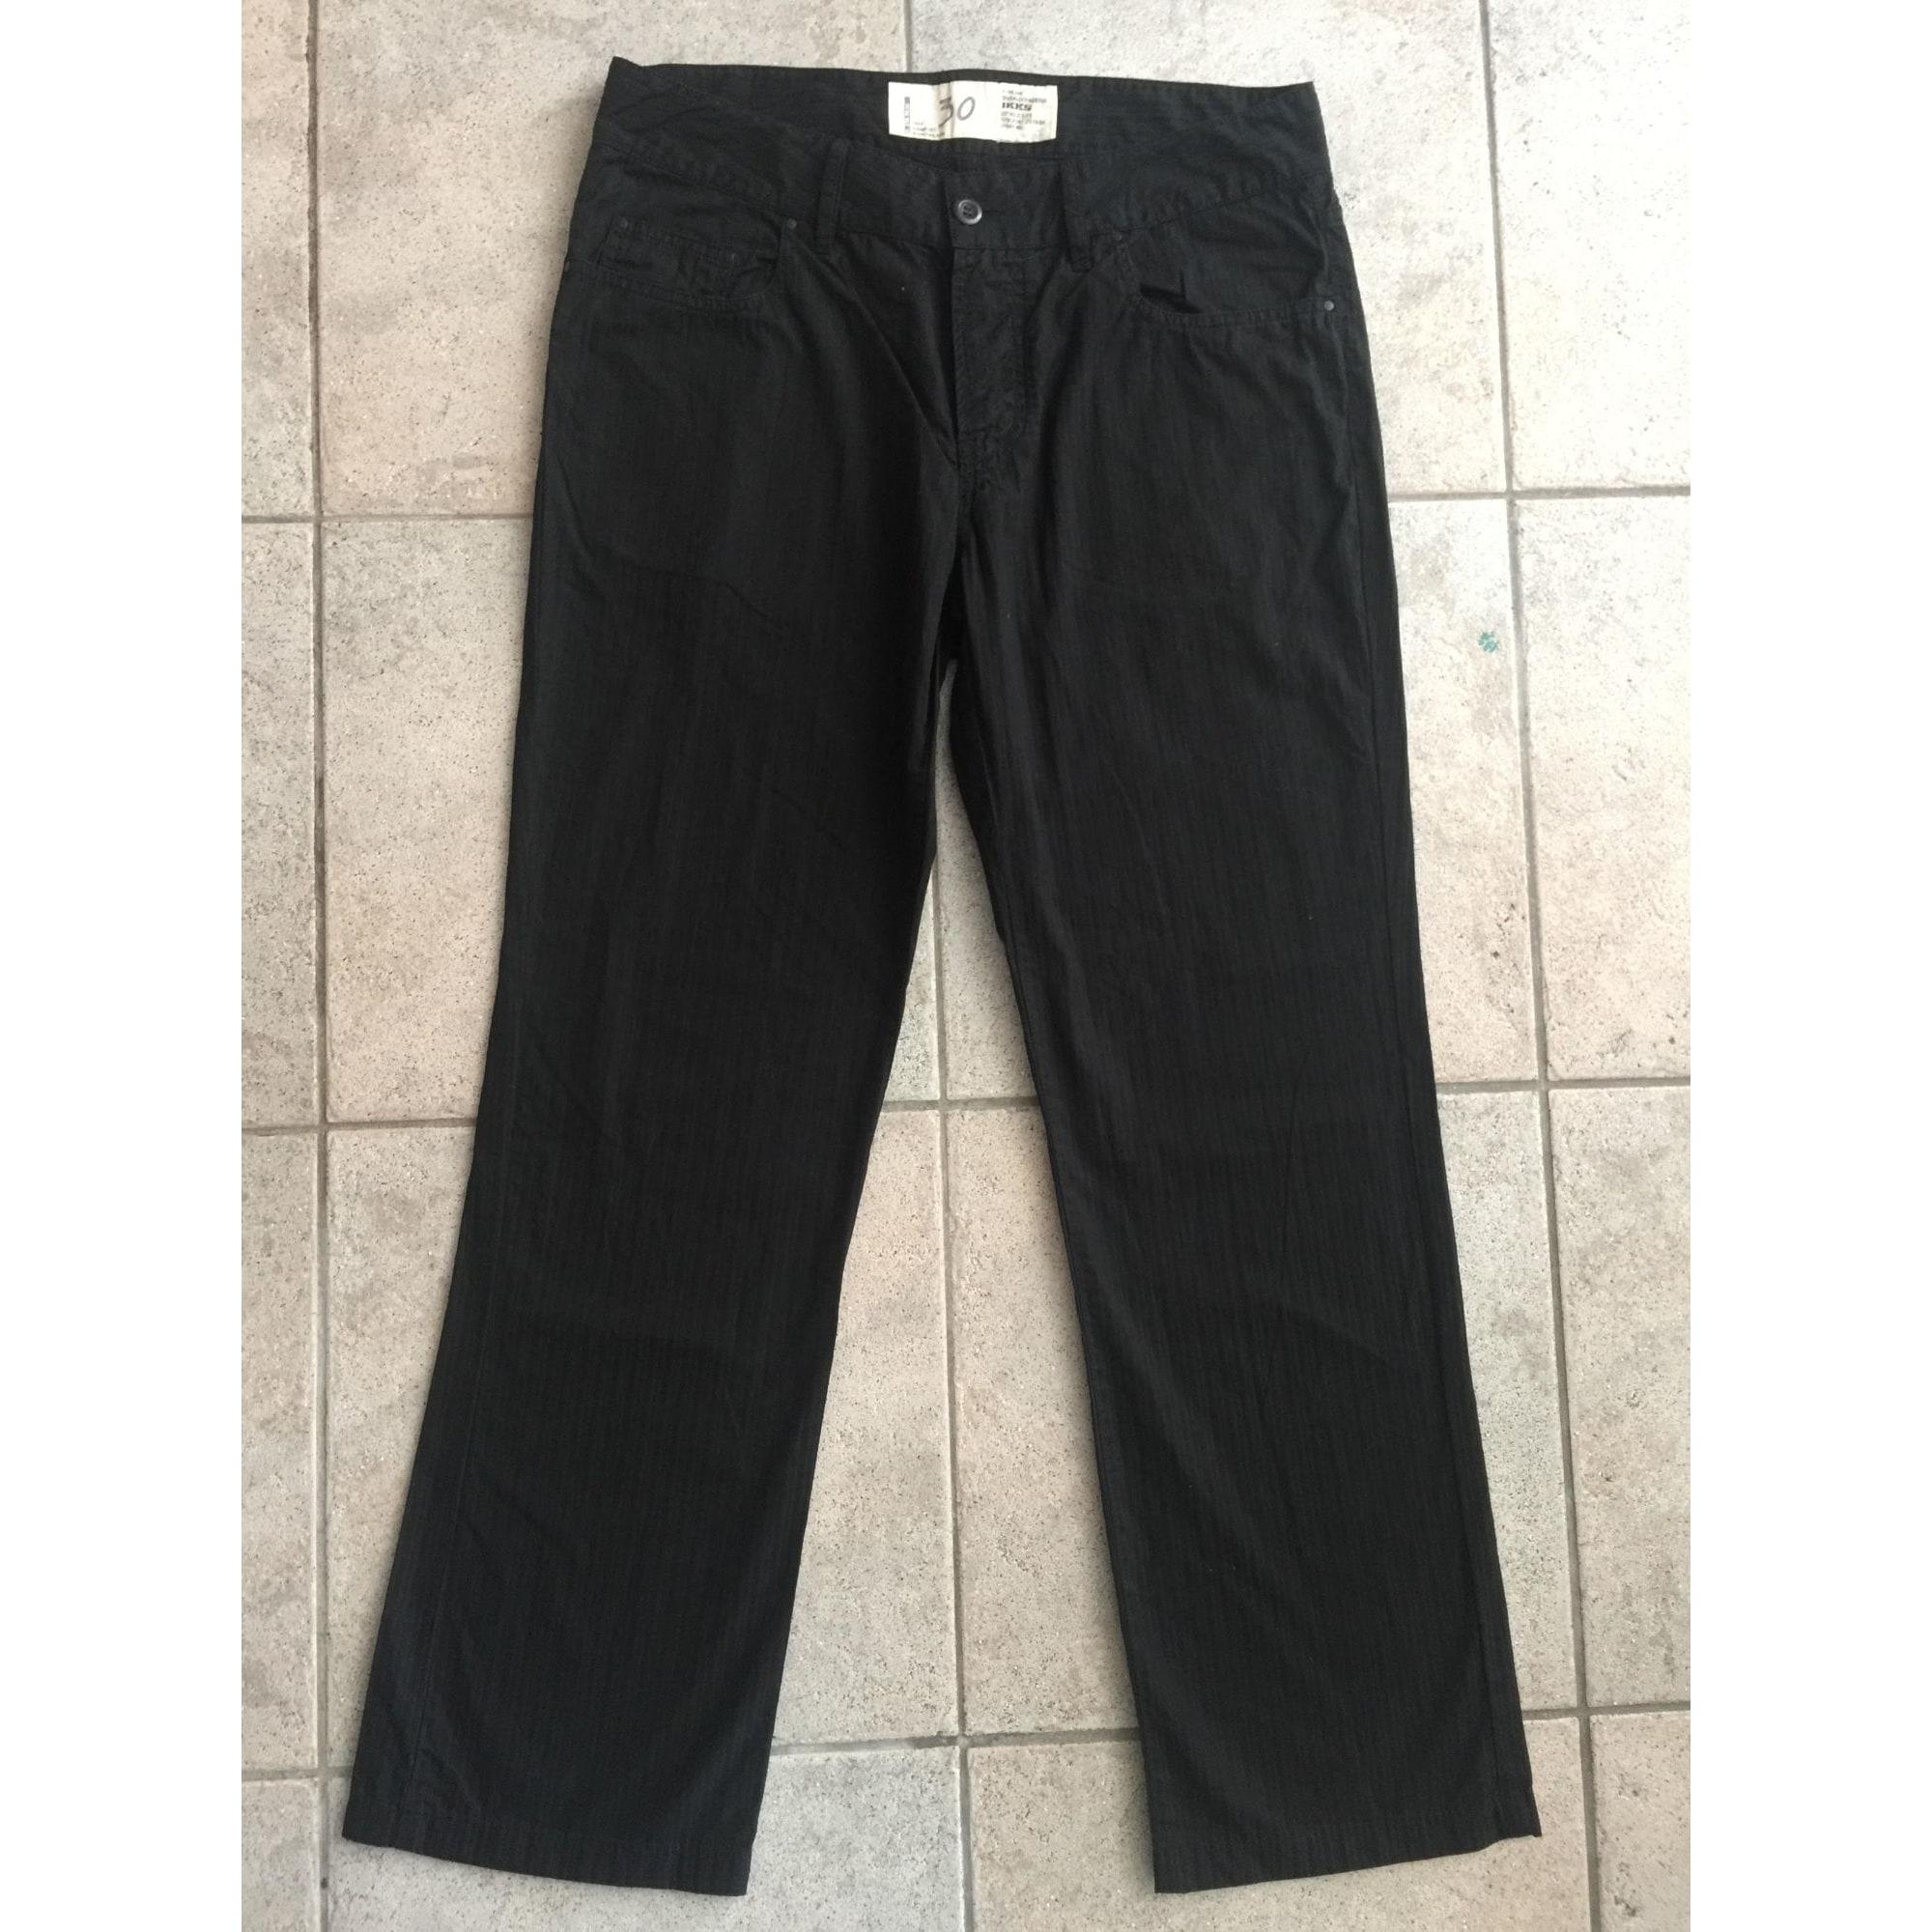 Pantalon droit IKKS Noir